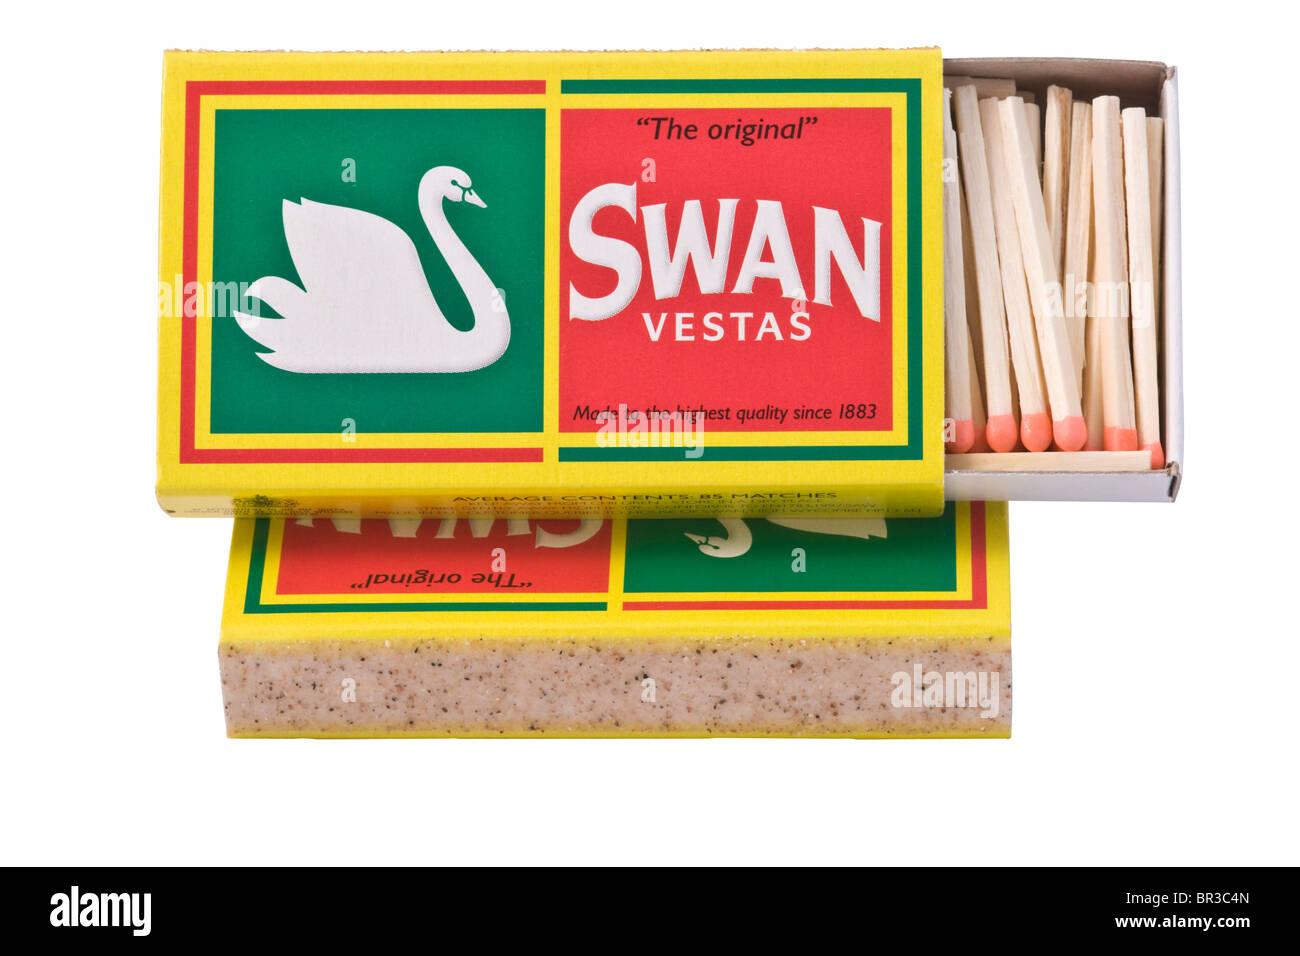 Swan Vesta Matches. - Stock Image